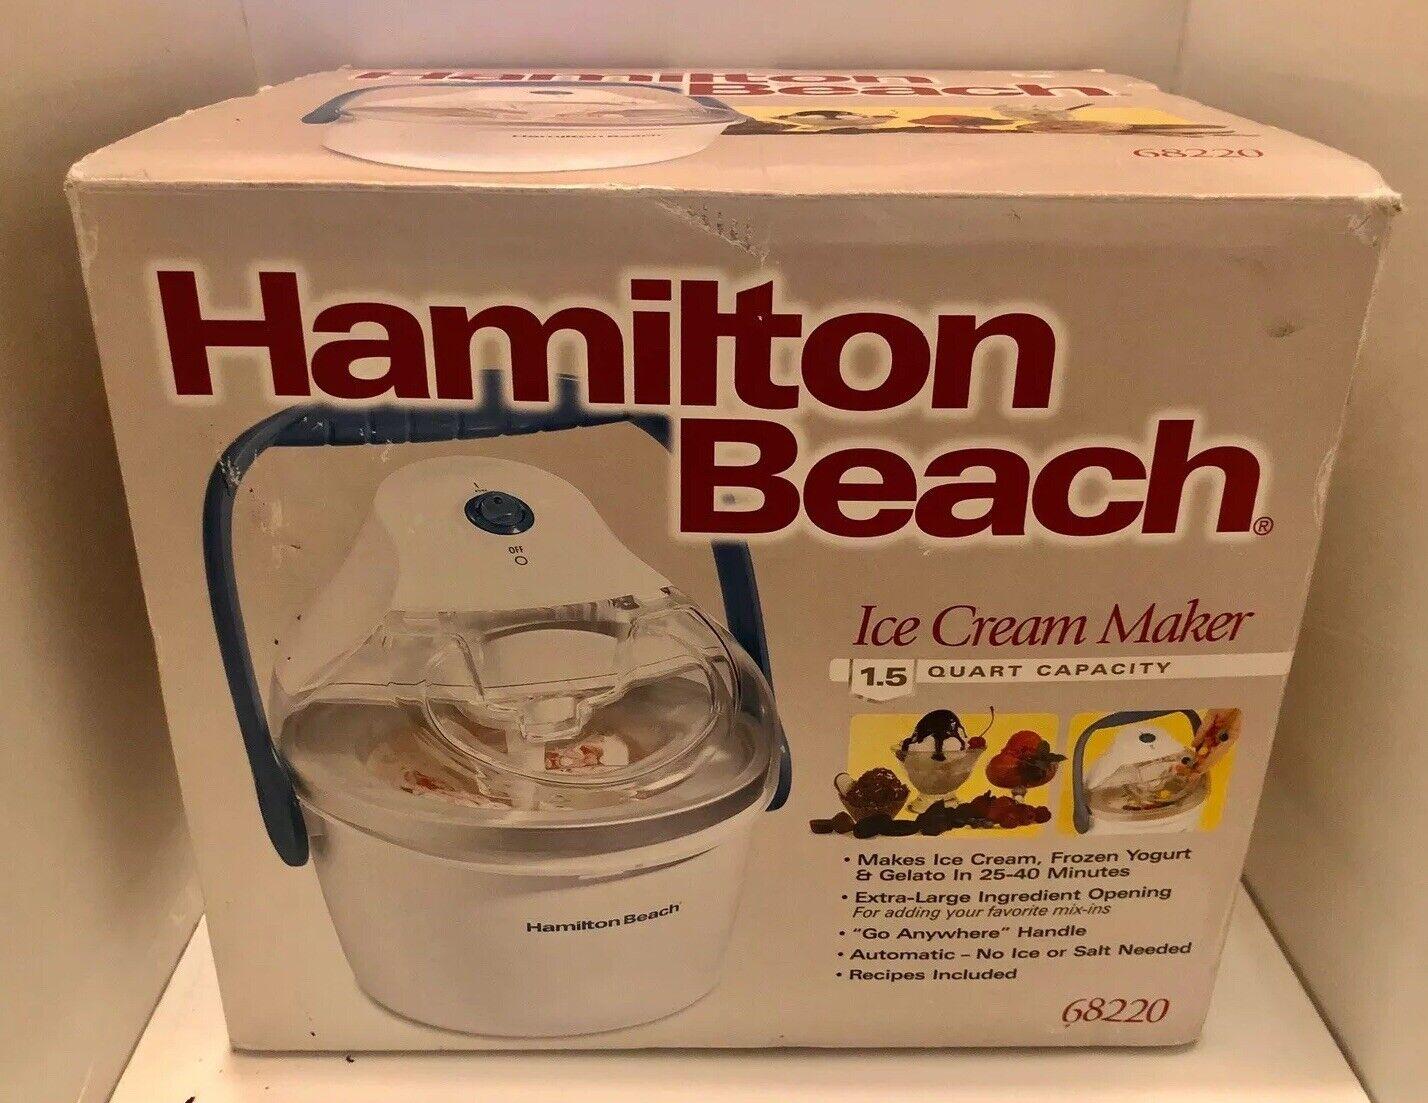 White Hamilton Beach 68220 1.5-Quart Capacity Ice Cream Maker ...